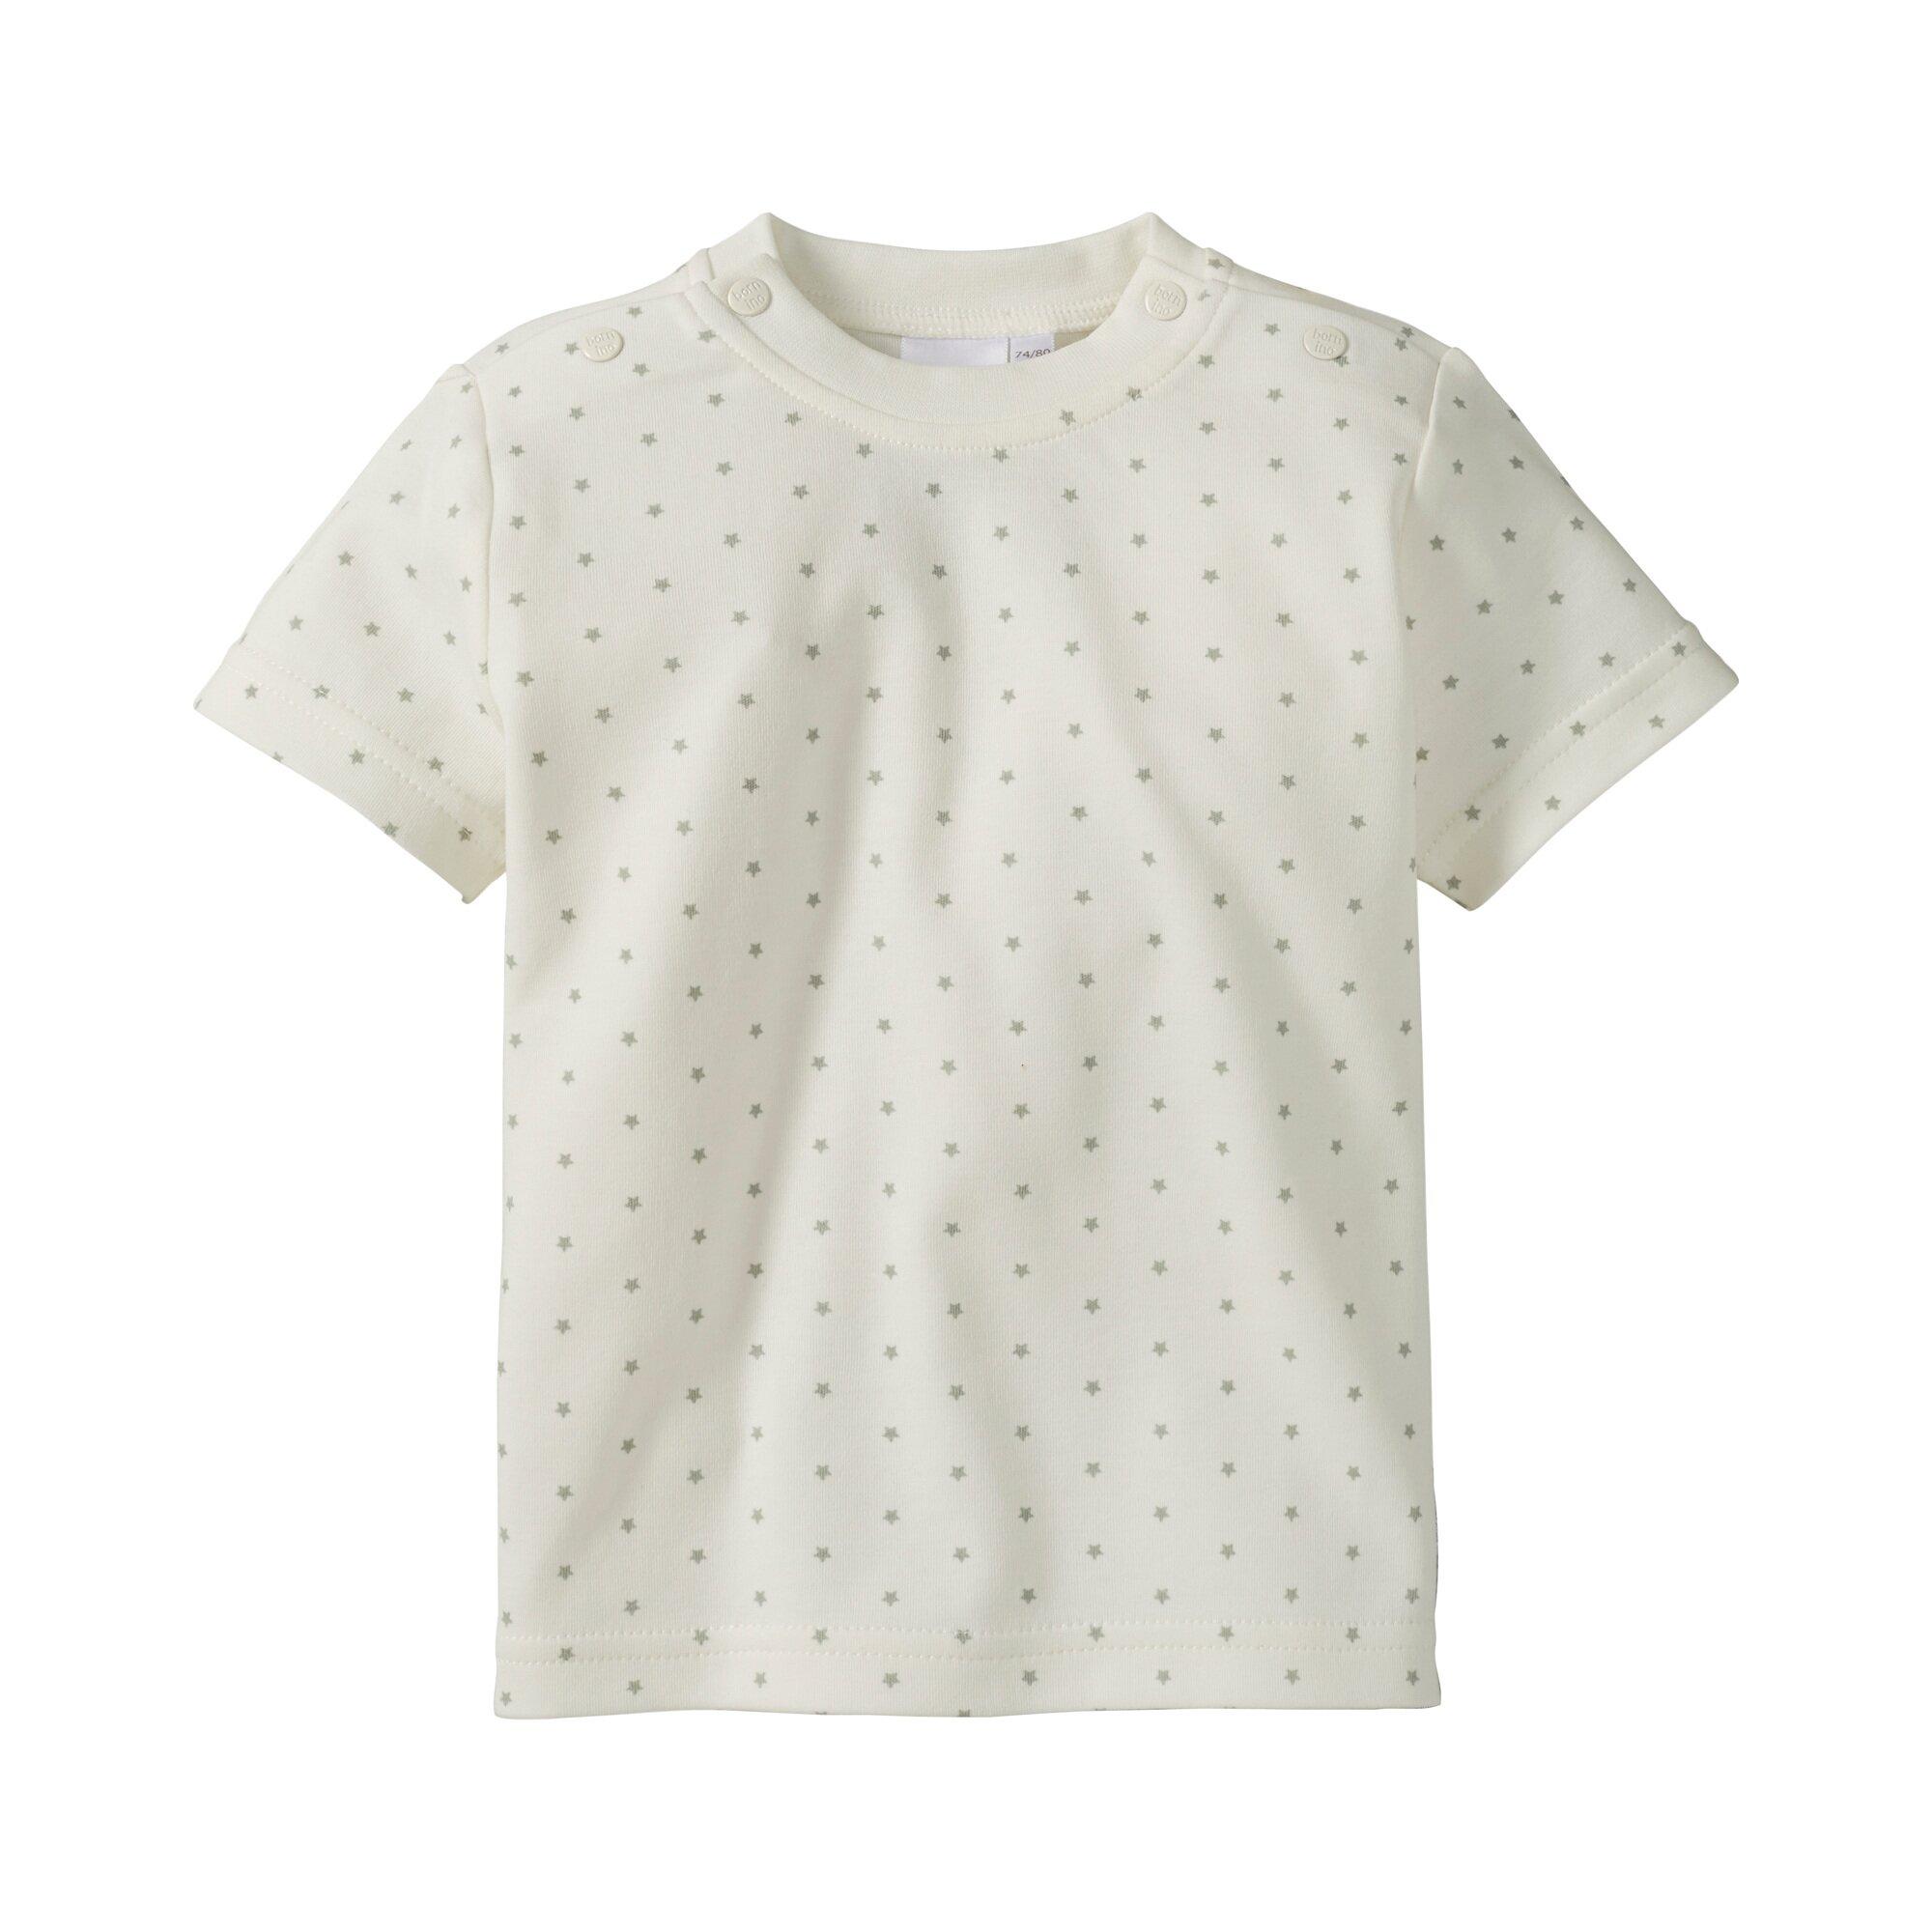 basics-schlafanzug-2tlg-kurze-hose-t-shirt